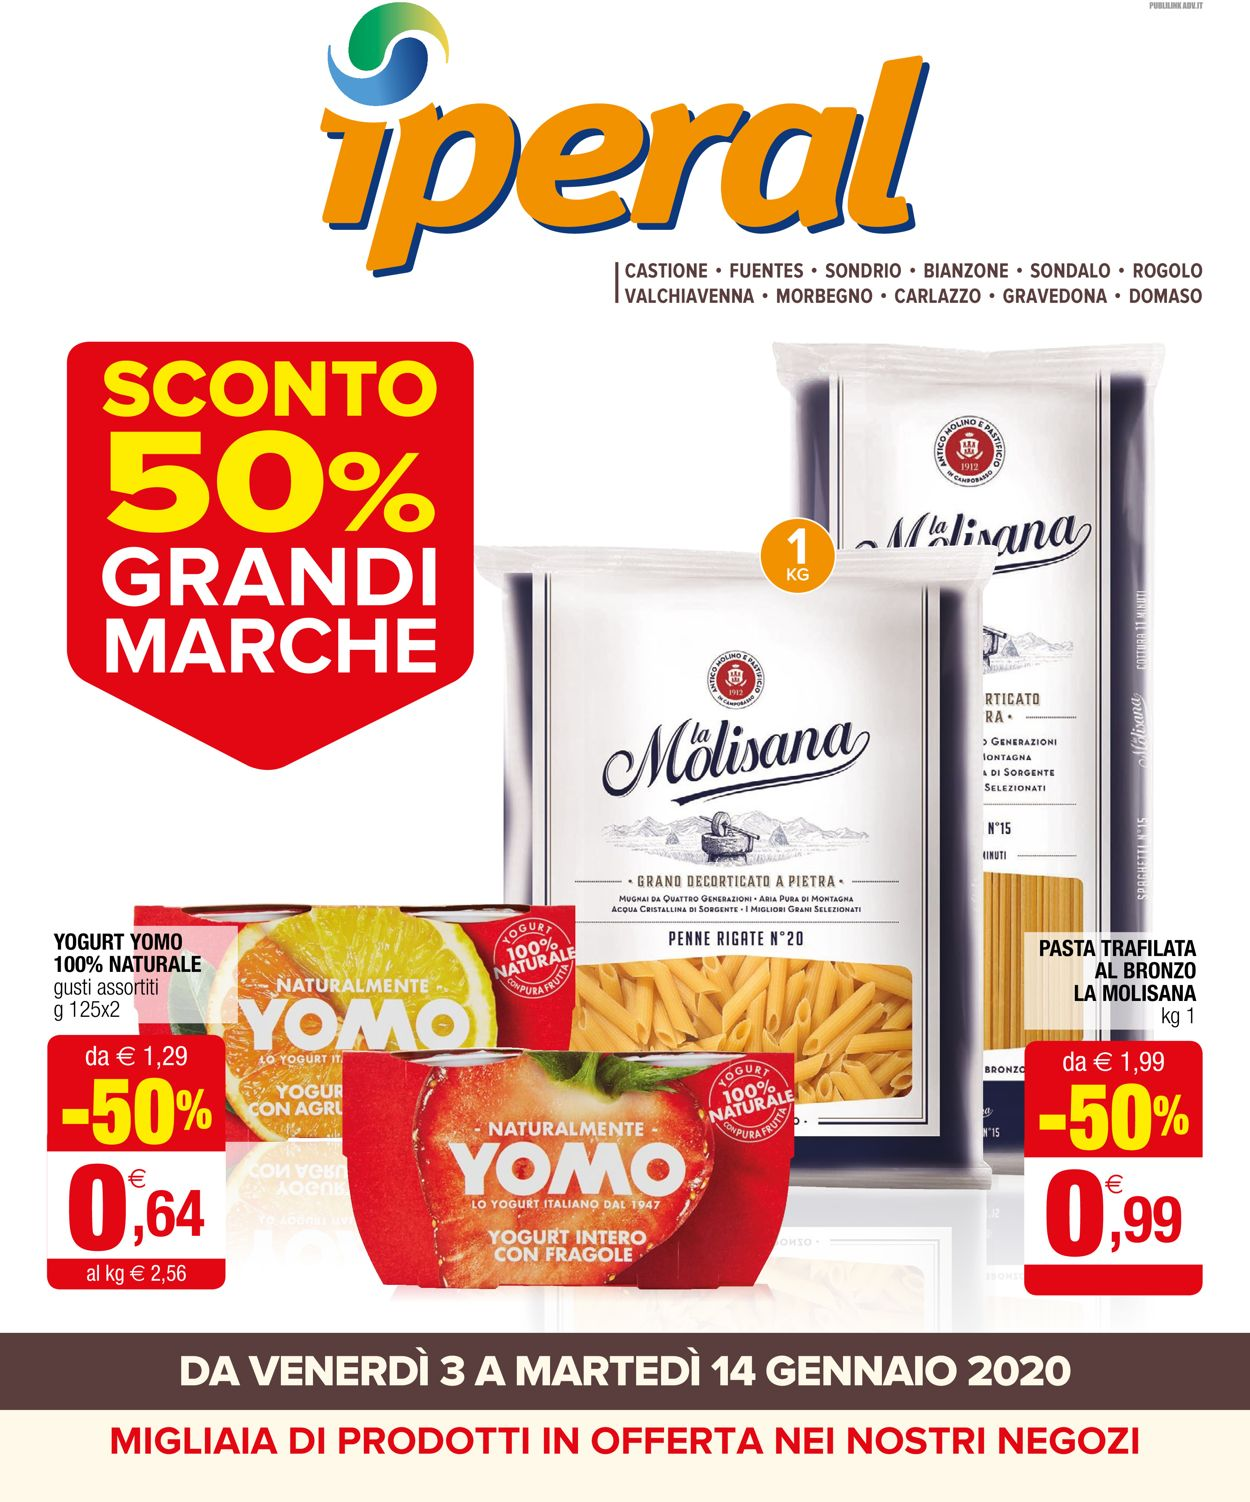 Volantino Iperal - Offerte 03/01-14/01/2020